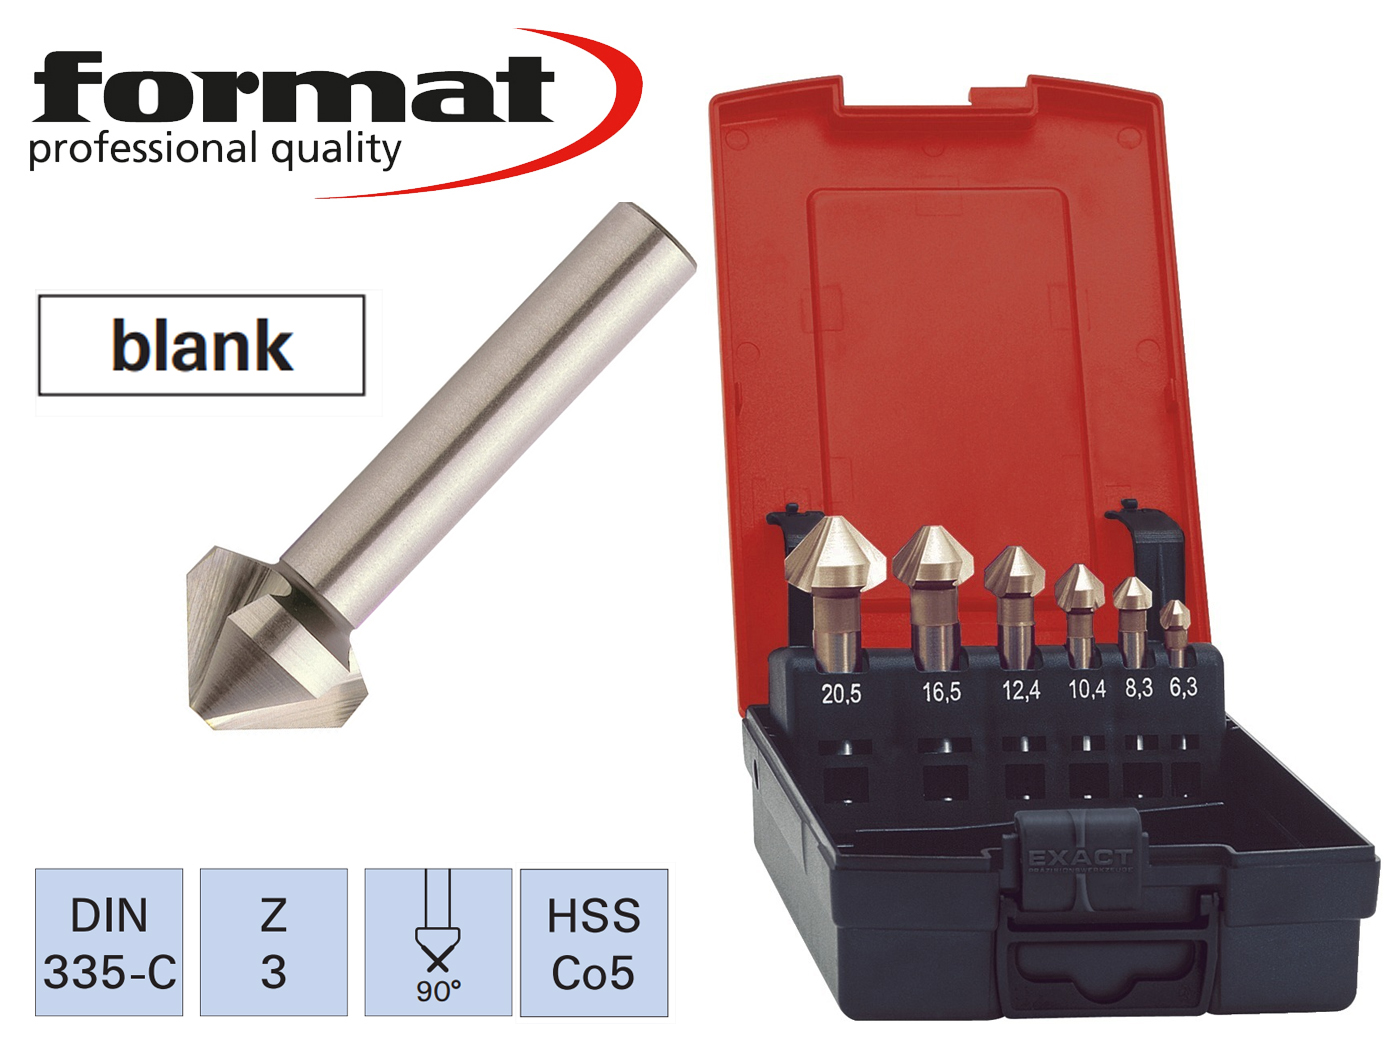 verzinkborenset DIN 335 C HSS 90 G FORMAT | DKMTools - DKM Tools